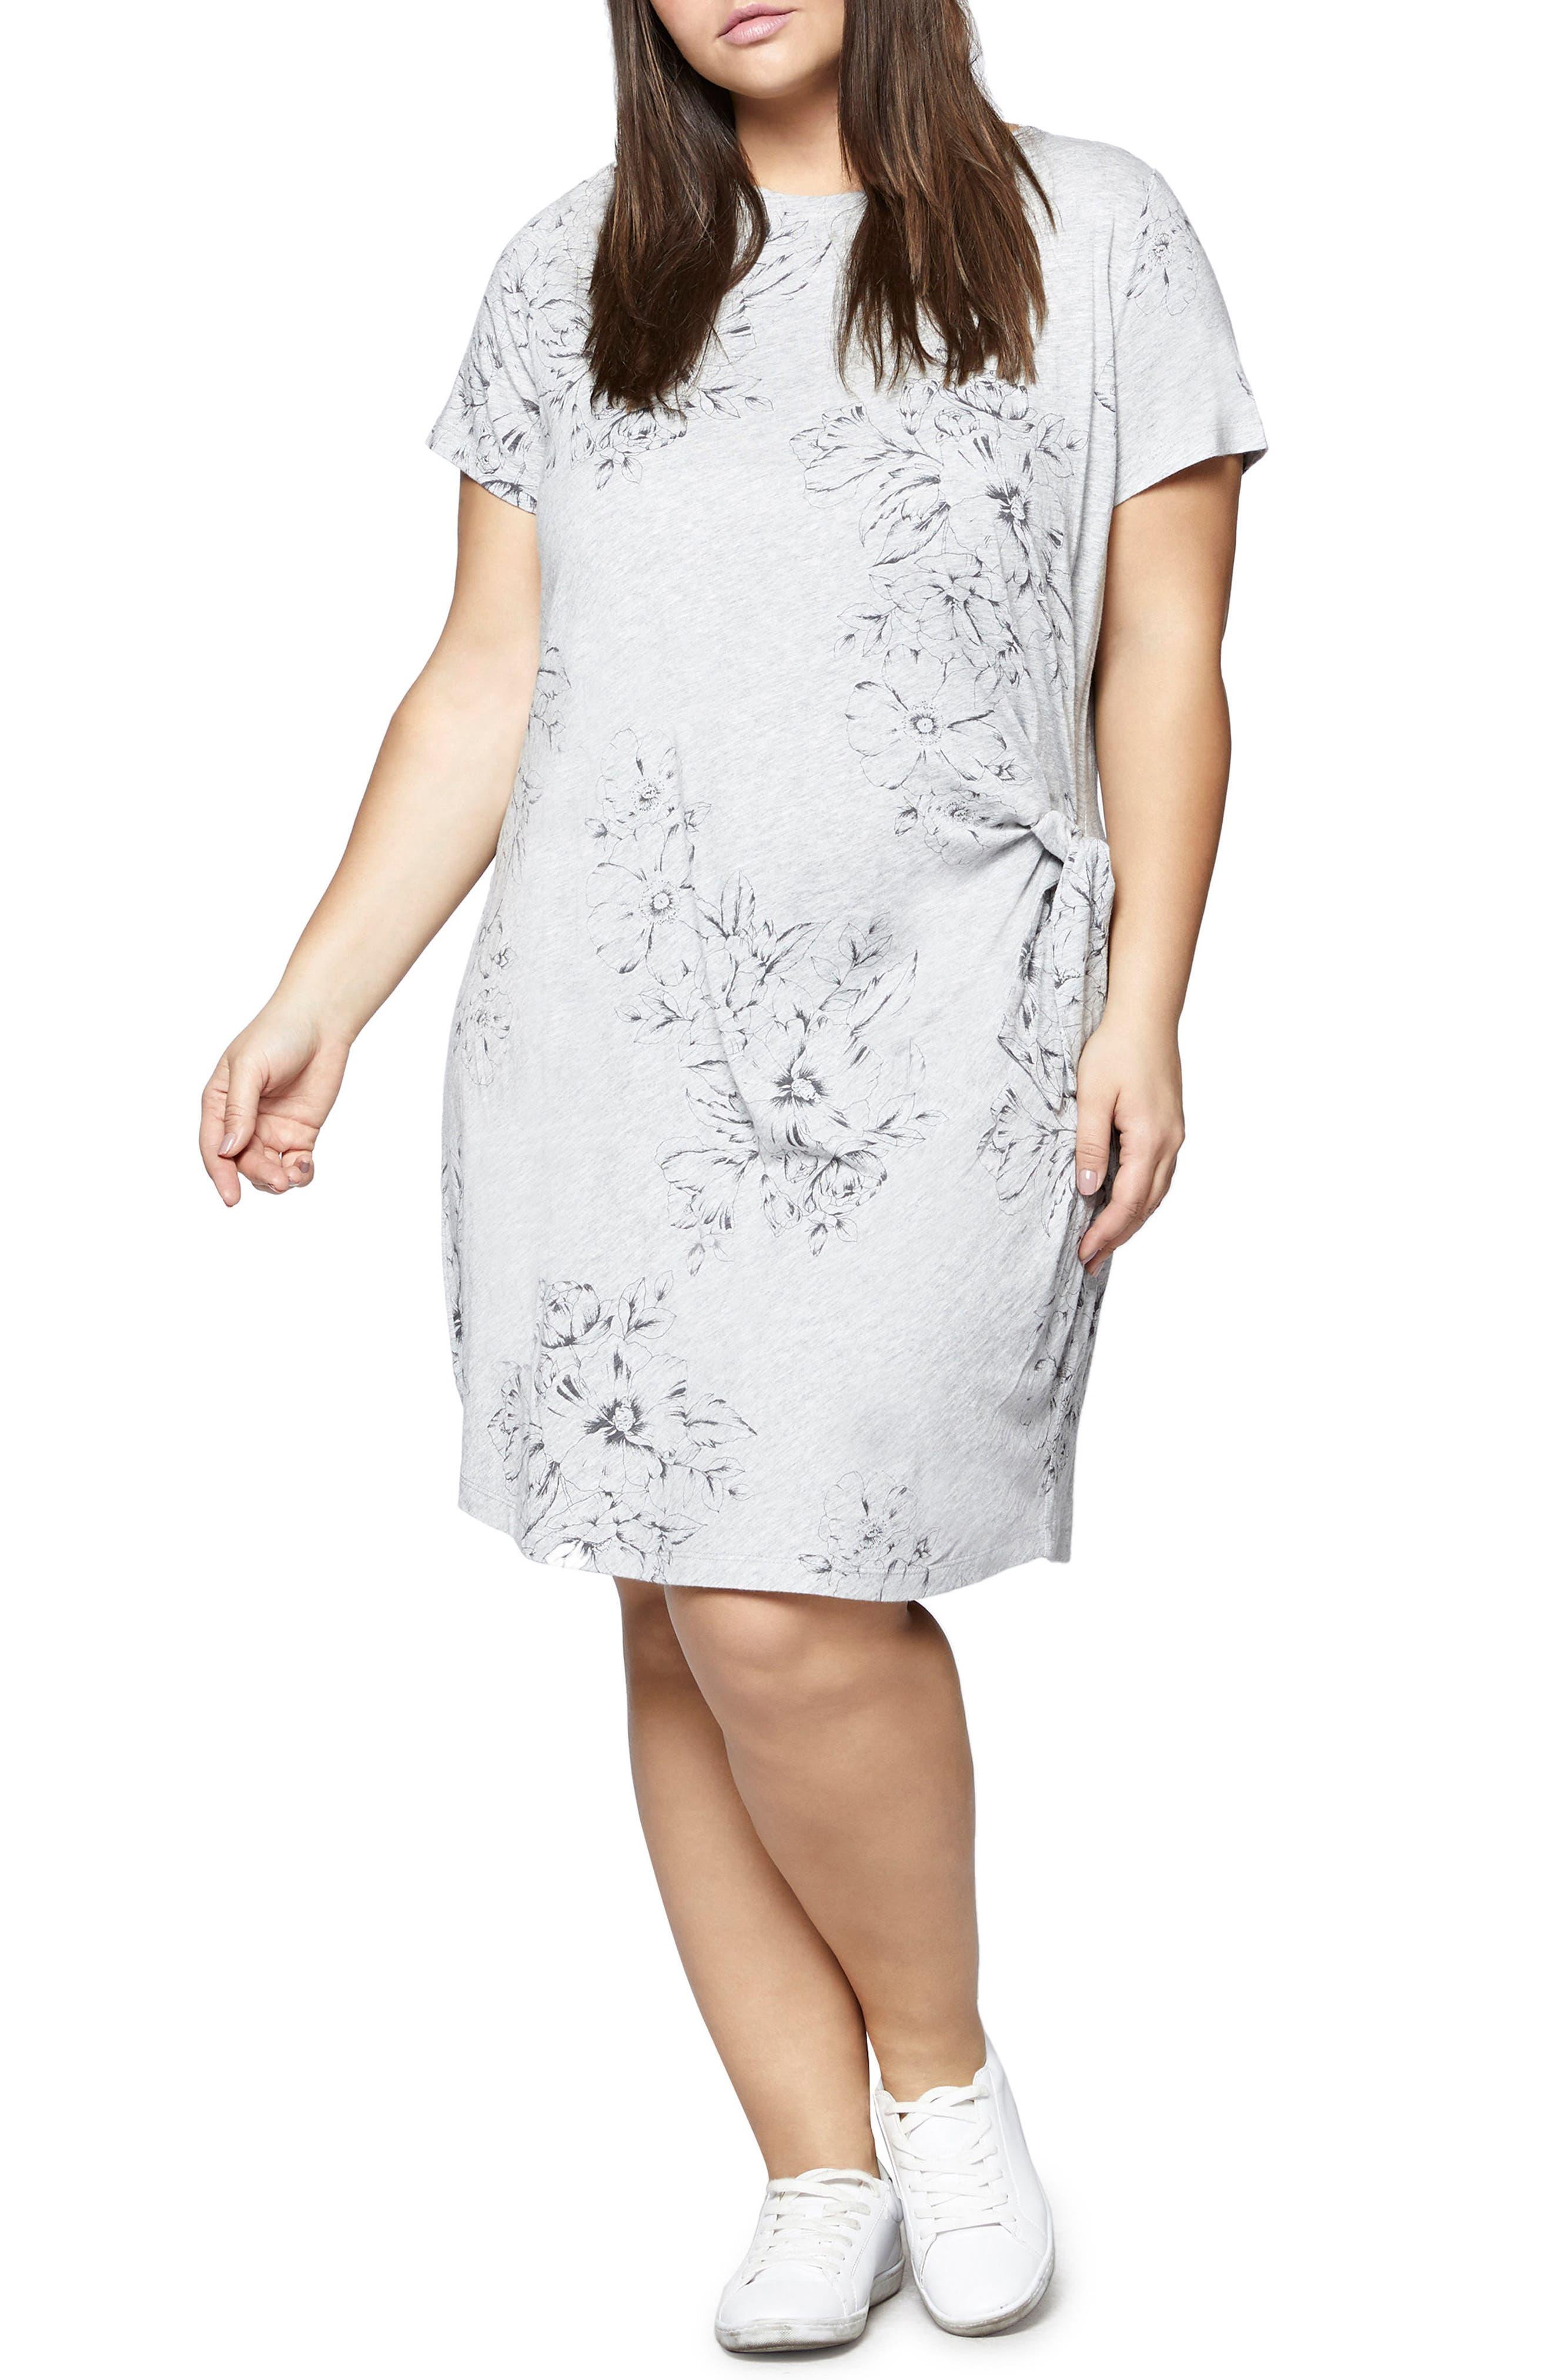 Wrapsody Print T-Shirt Dress,                             Main thumbnail 1, color,                             Heather Grey